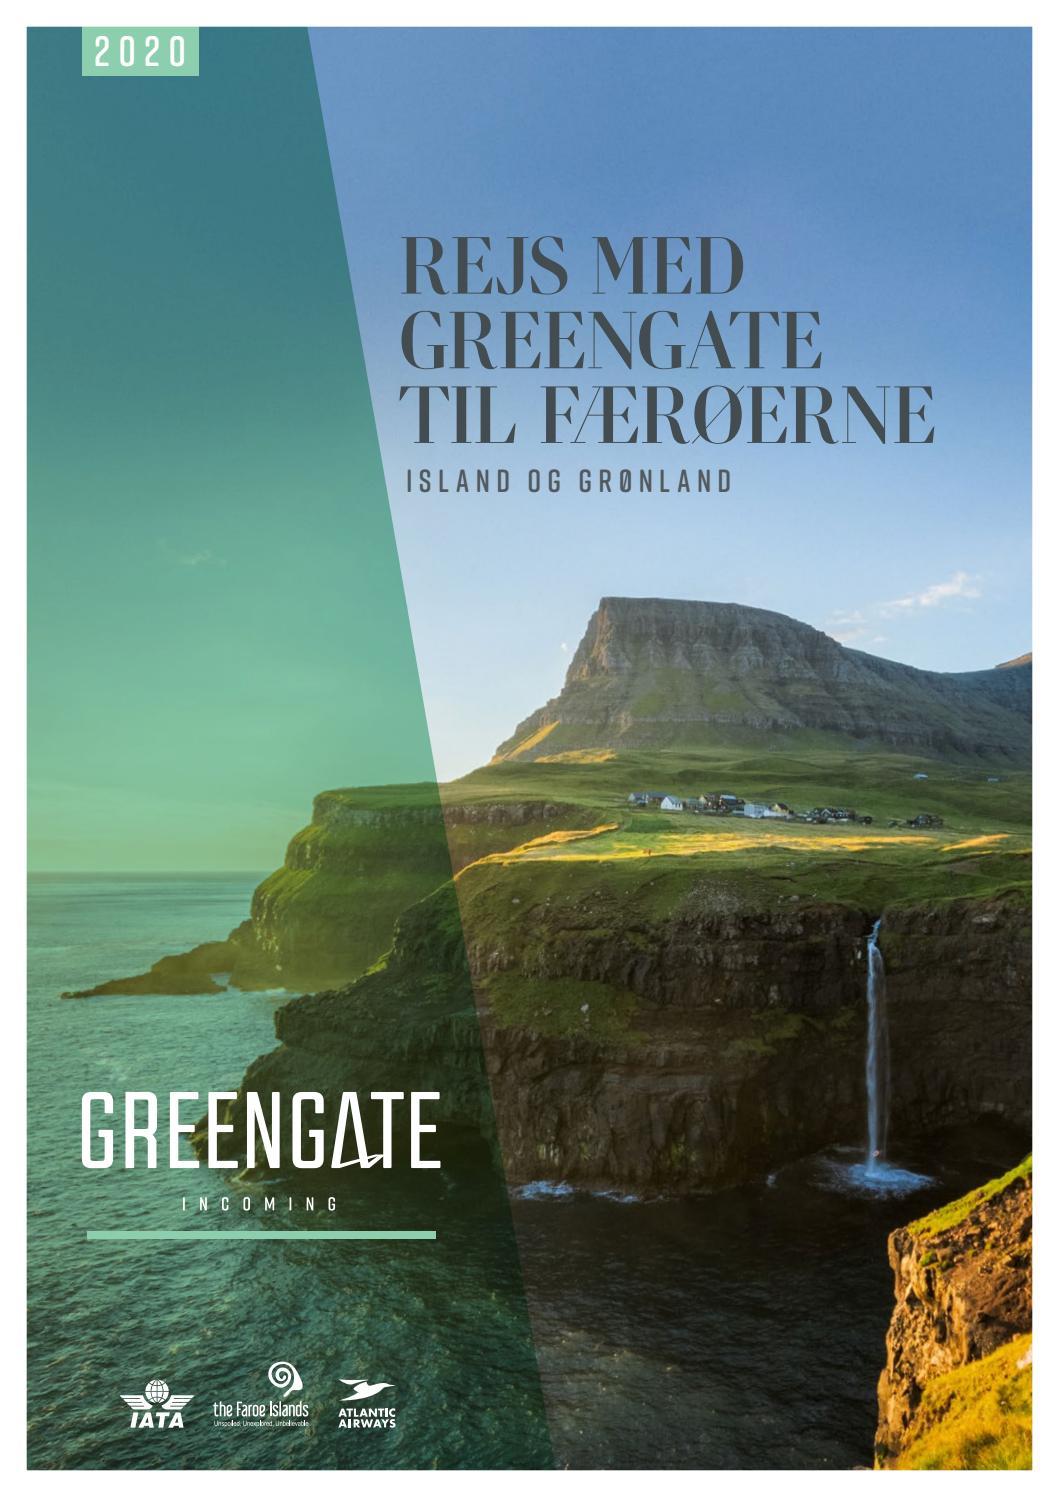 Rejser Til Faeroerne 2020 By Greengate Incoming Issuu